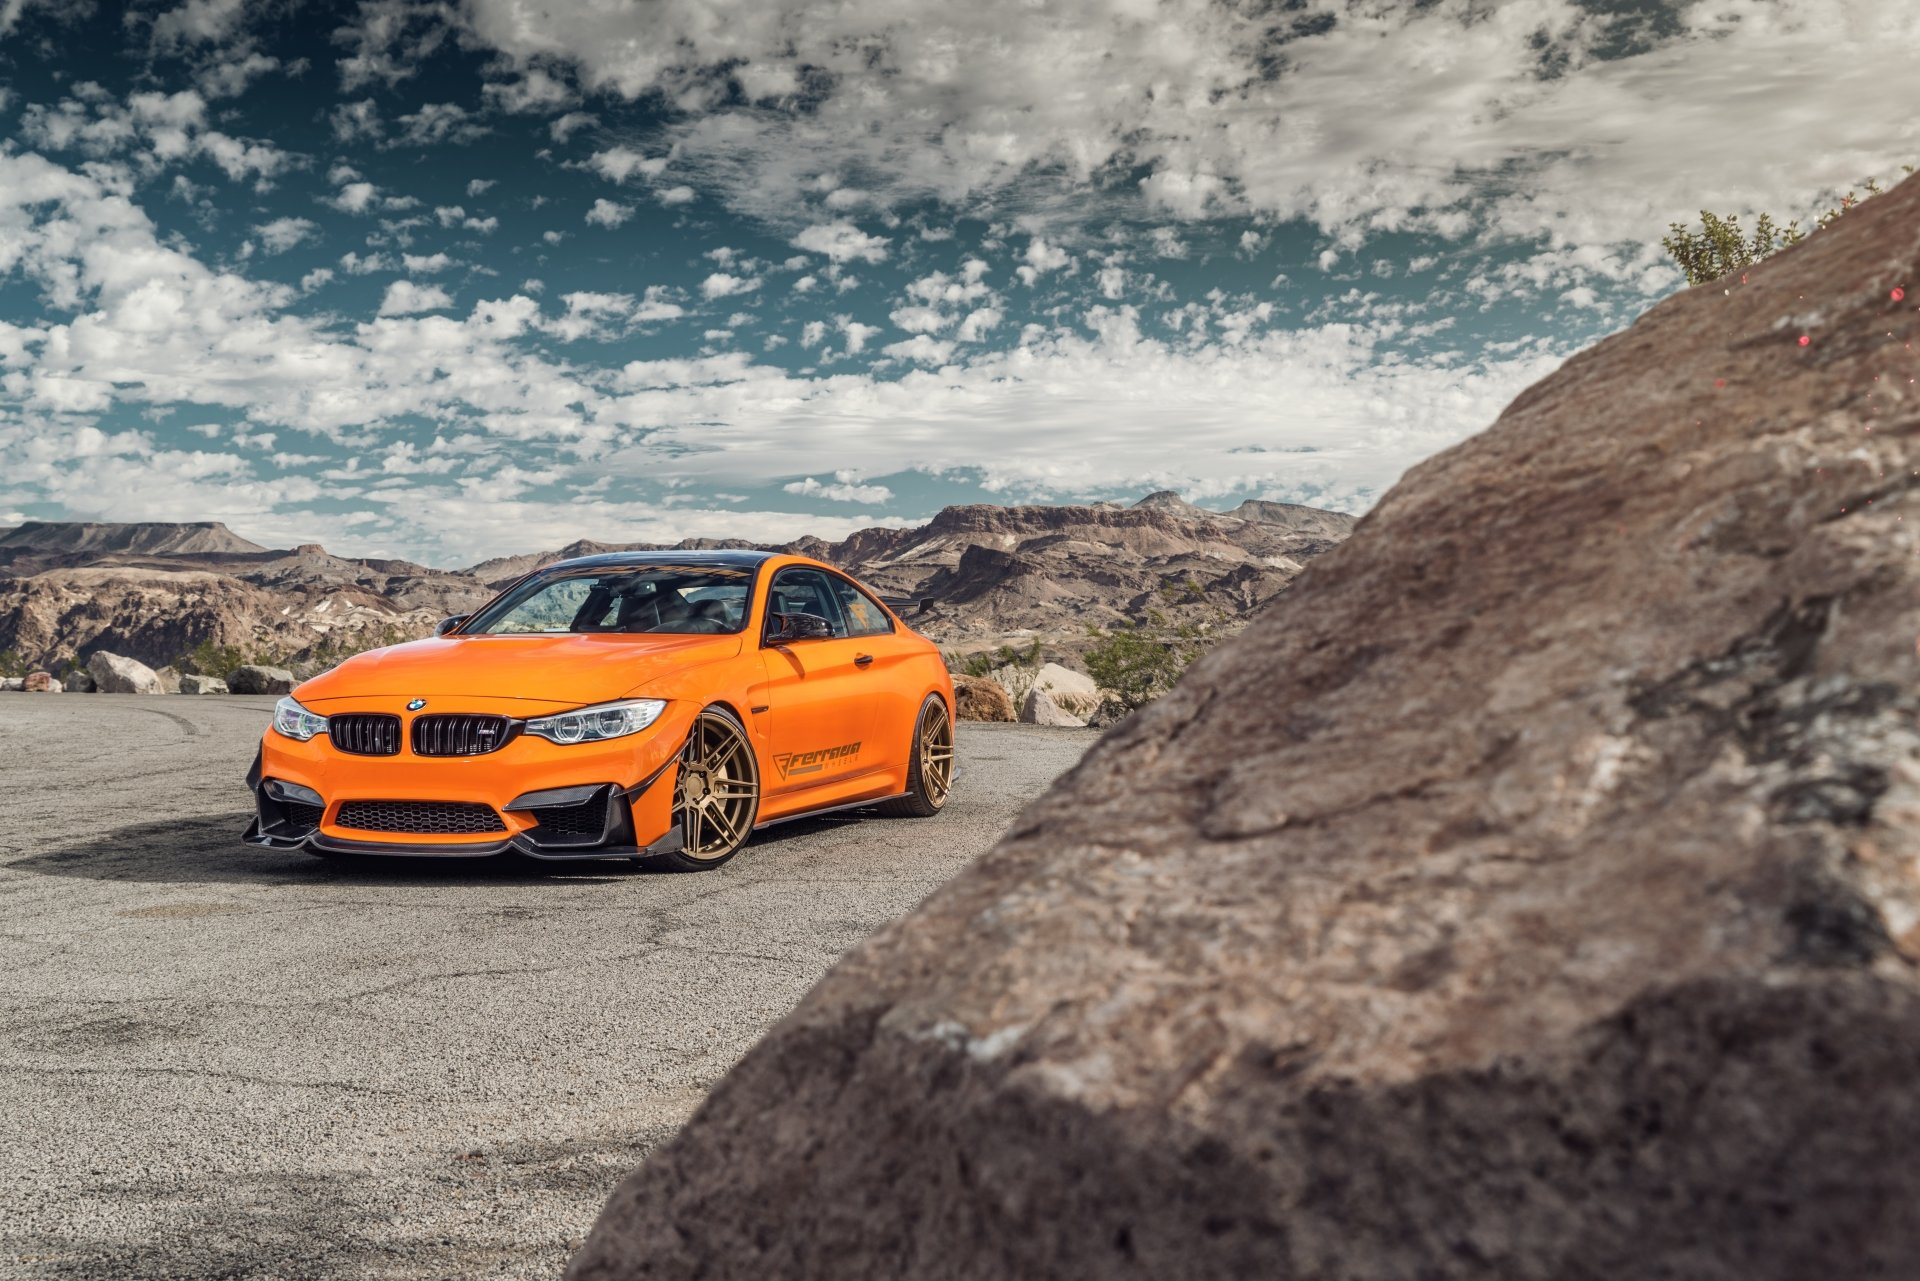 Vehicles - BMW M4  BMW Car Vehicle Sport Car Orange Car Wallpaper